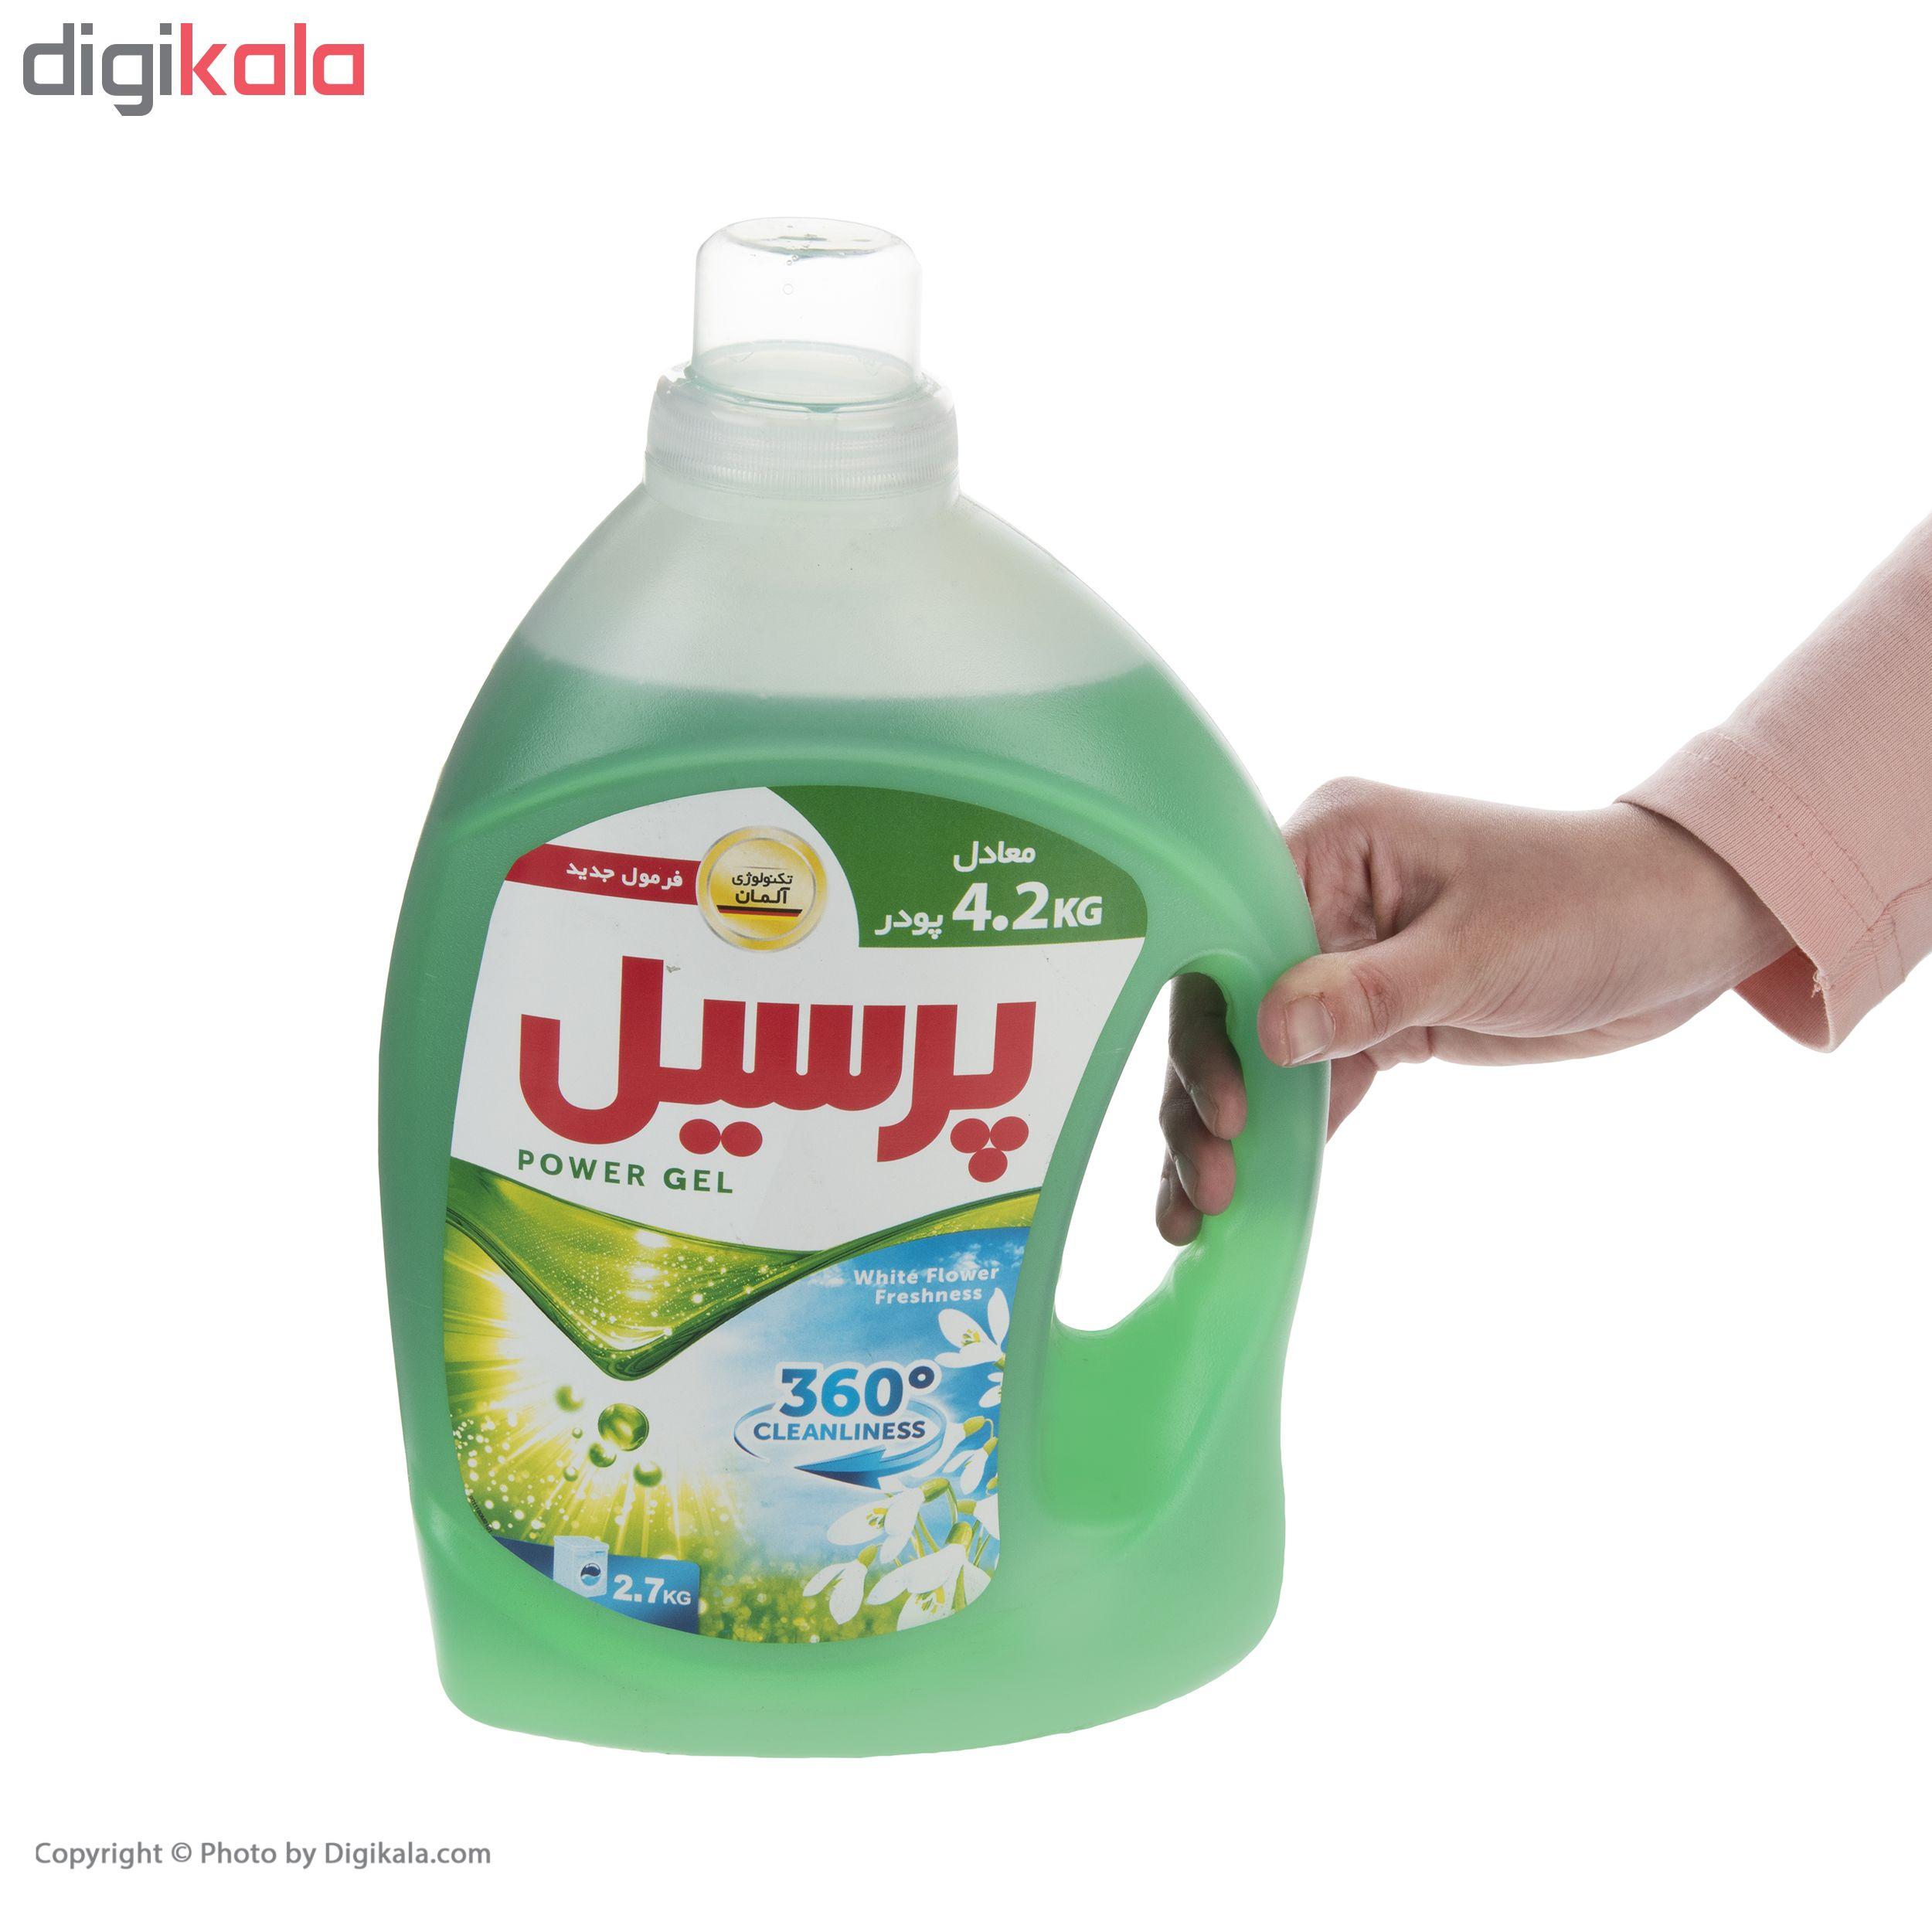 مایع ماشین لباسشویی پرسیل مدل 360Degree Cleanliness مقدار 2.7 کیلوگرم main 1 3